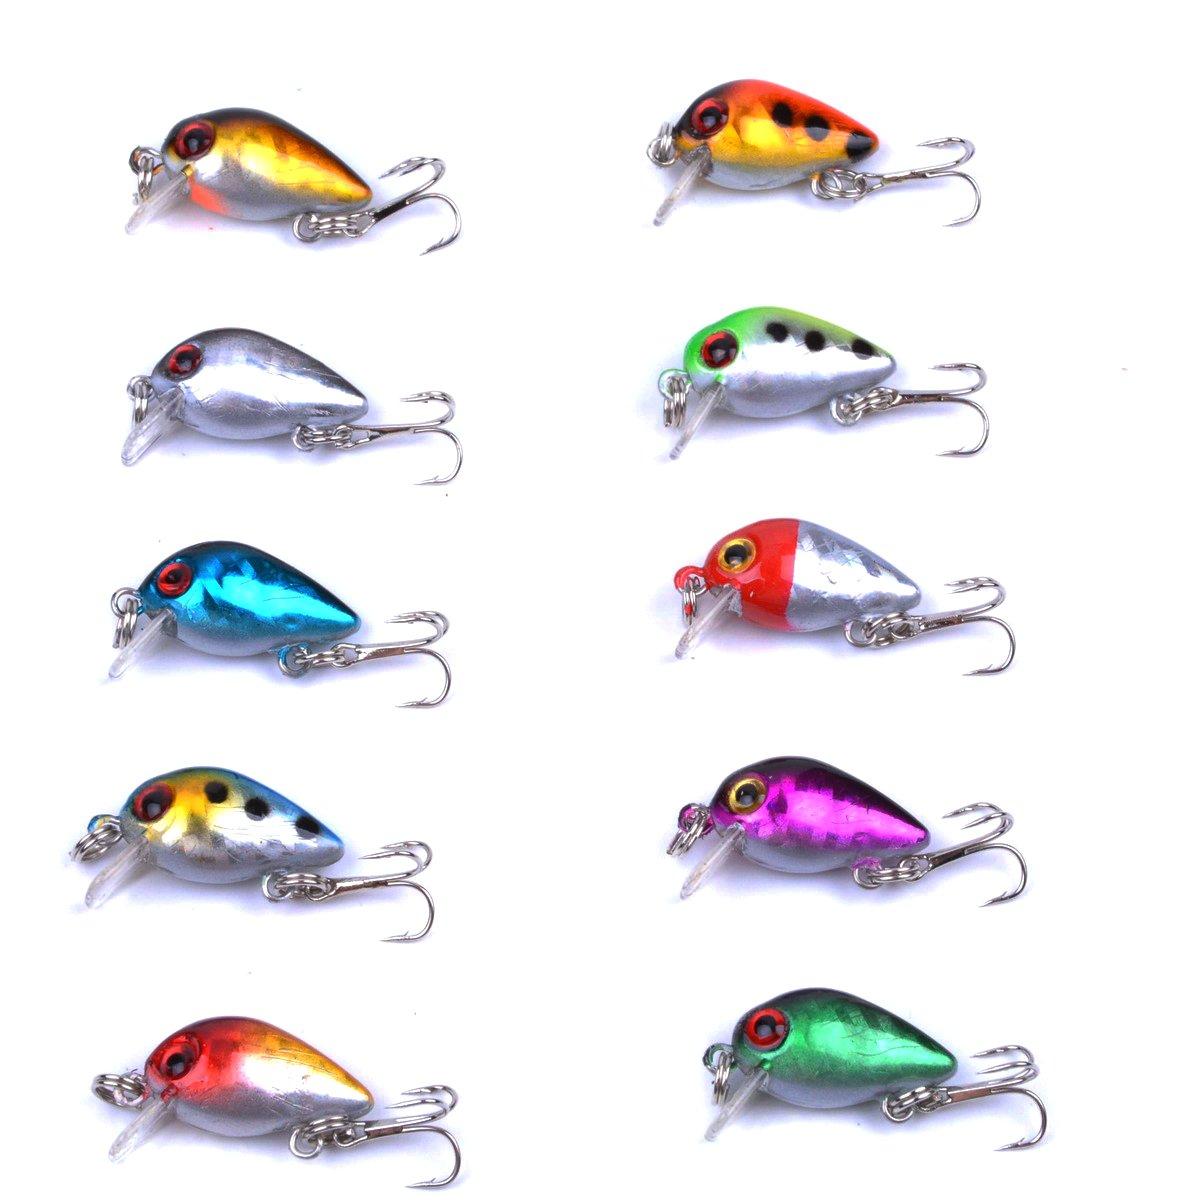 Aorace 10pcs Lot Mini Fishing Lures 10 Colors Spoon Lure Spinner Bait Metal Pcs Plus Box 26cm 16g Tackle High Carbon Steel Treble Hook Sports Outdoors